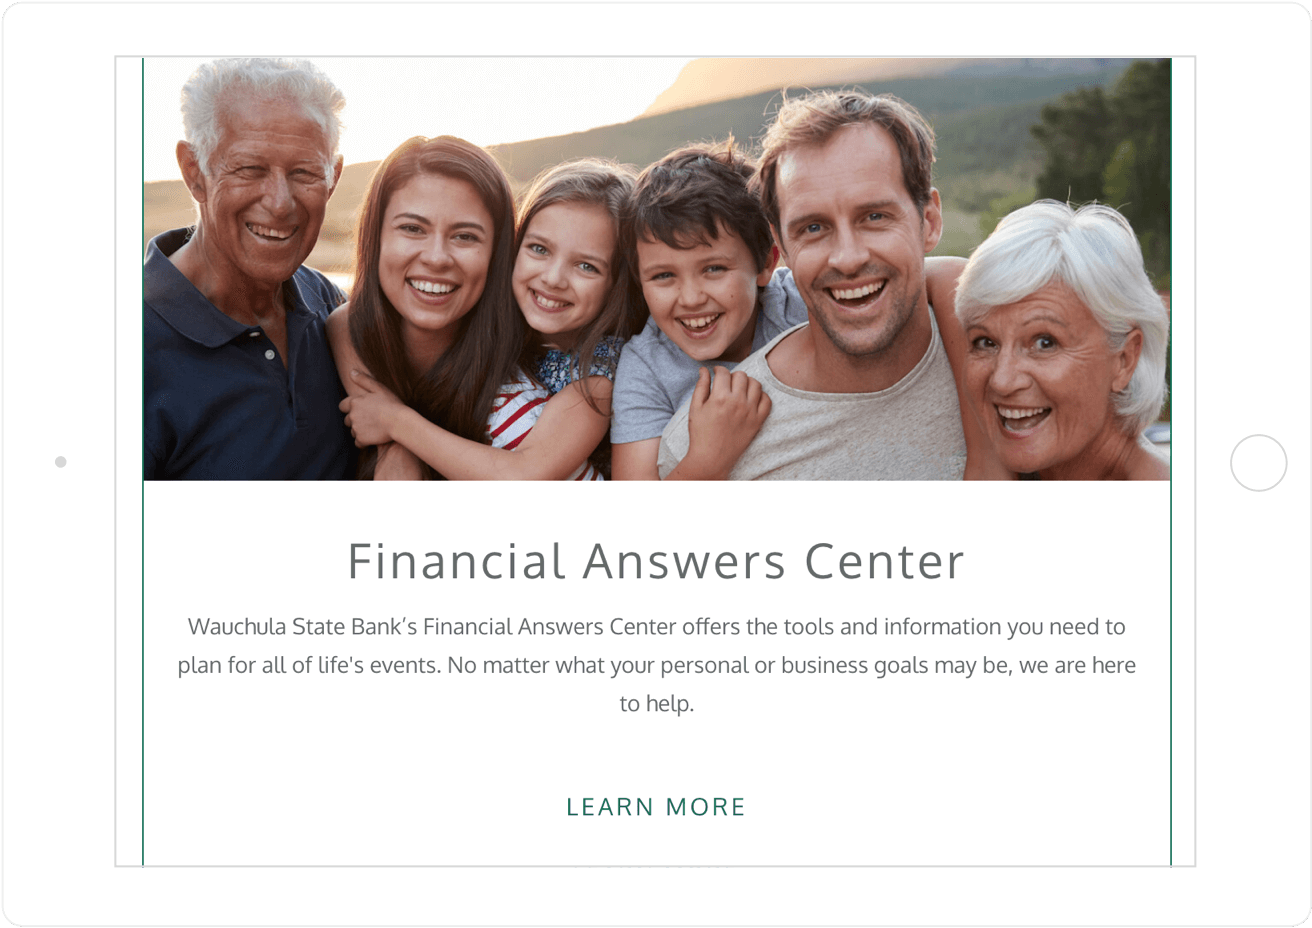 Crews Bank Corp Website Copy 1